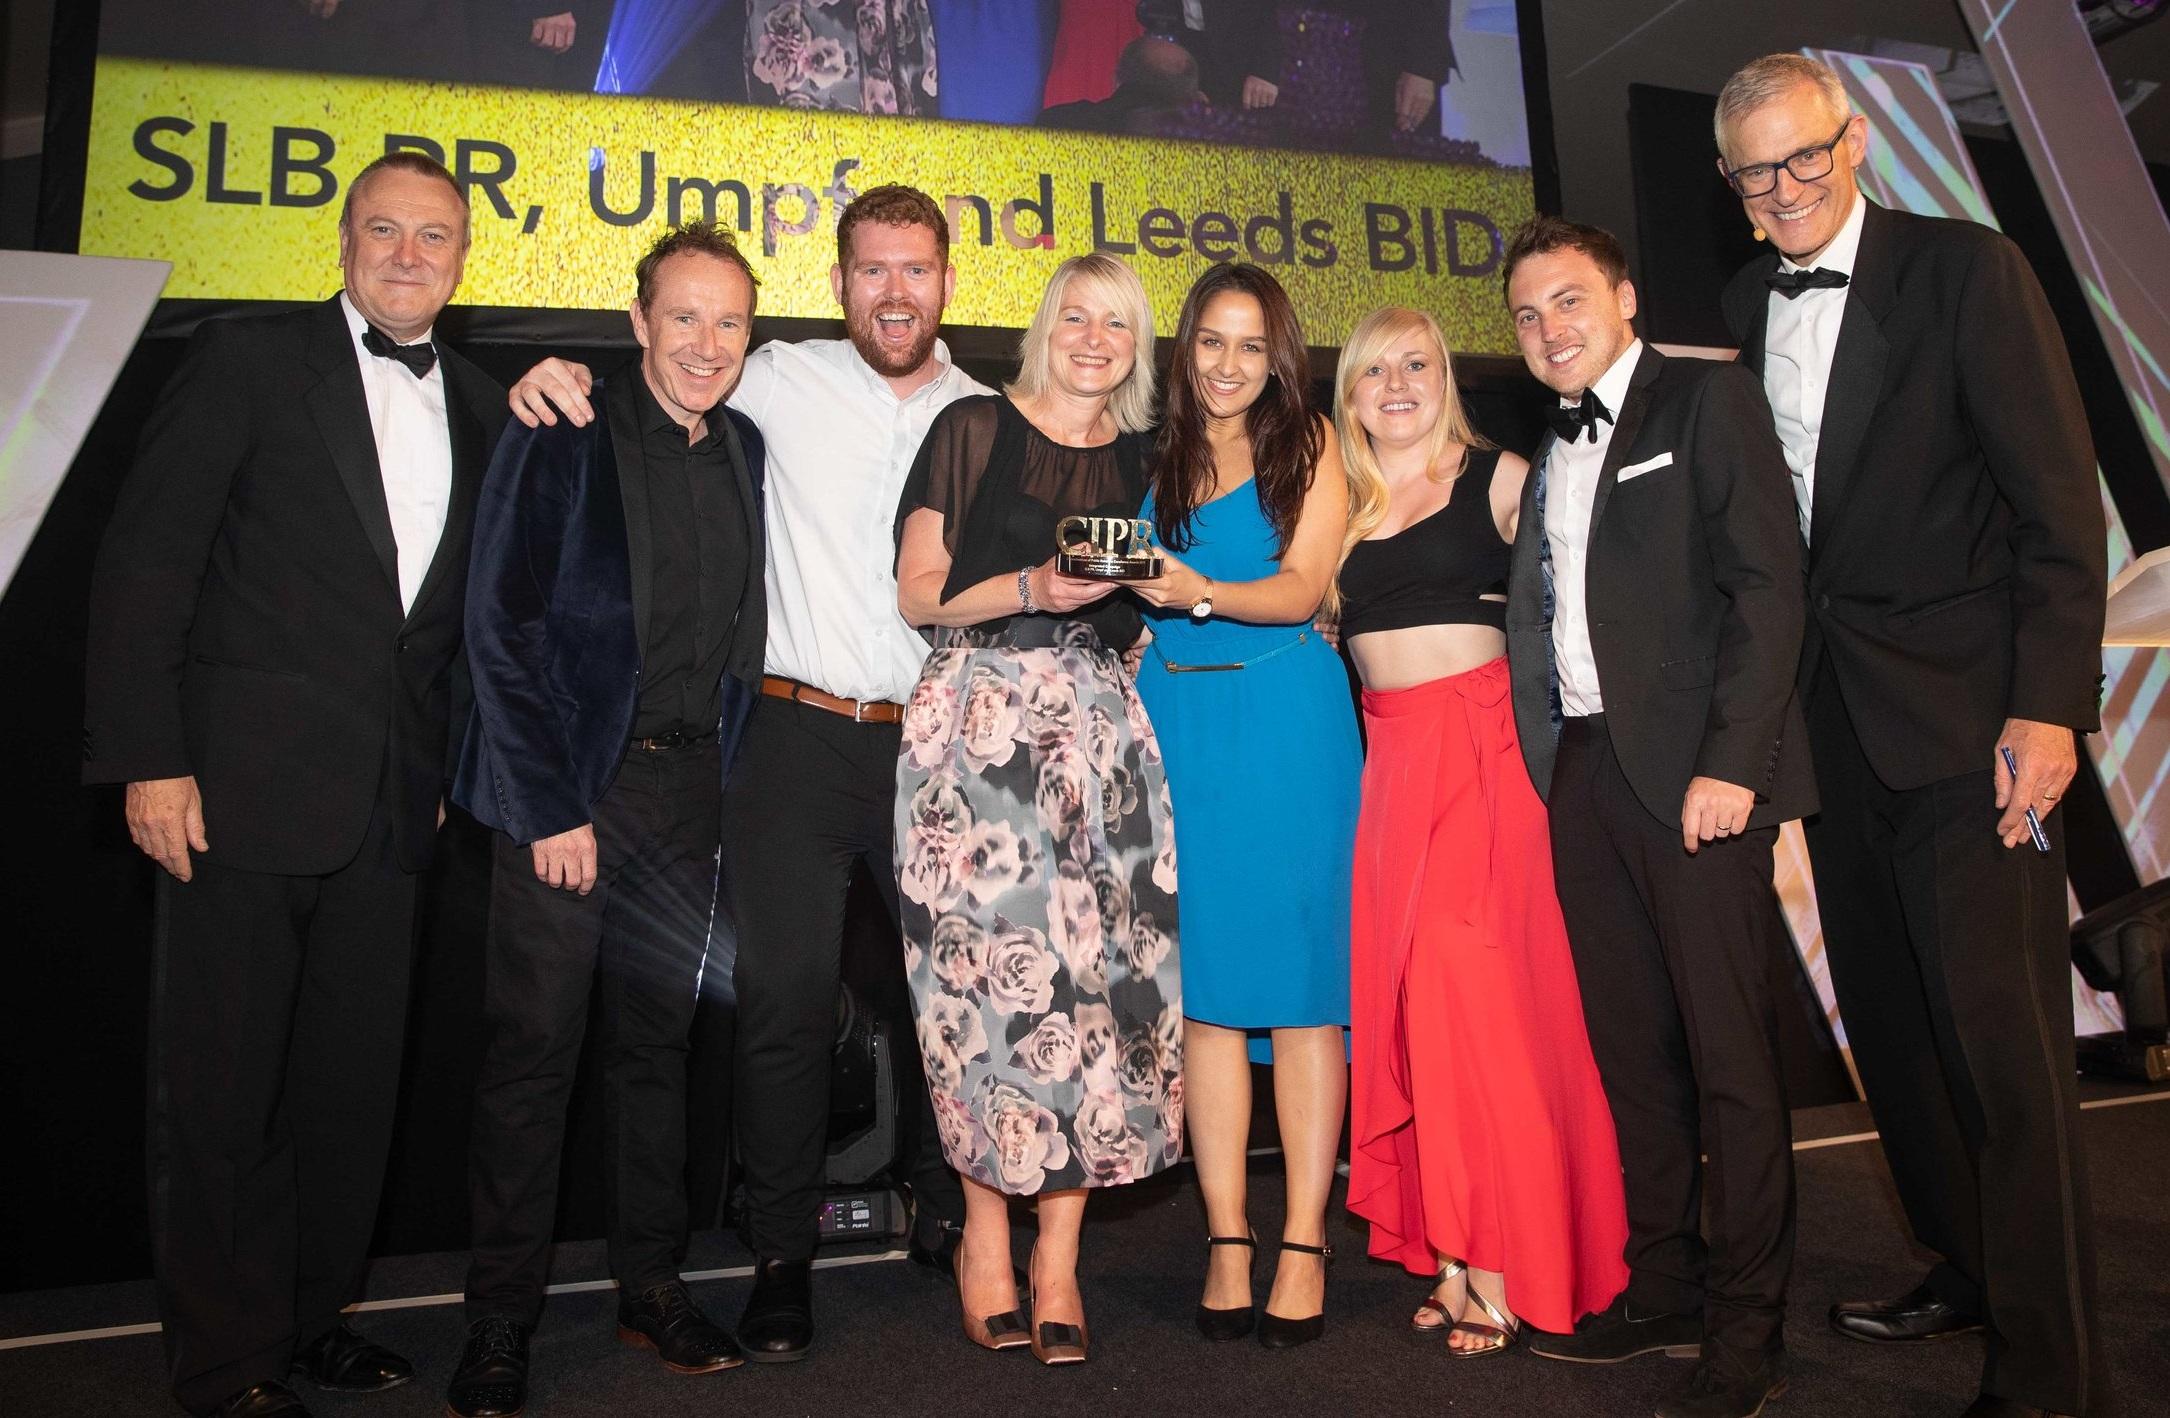 SLB PR's Sam Johnson (3rd left) joins LeedsBID's Sara Towns (centre) and Umpf PR